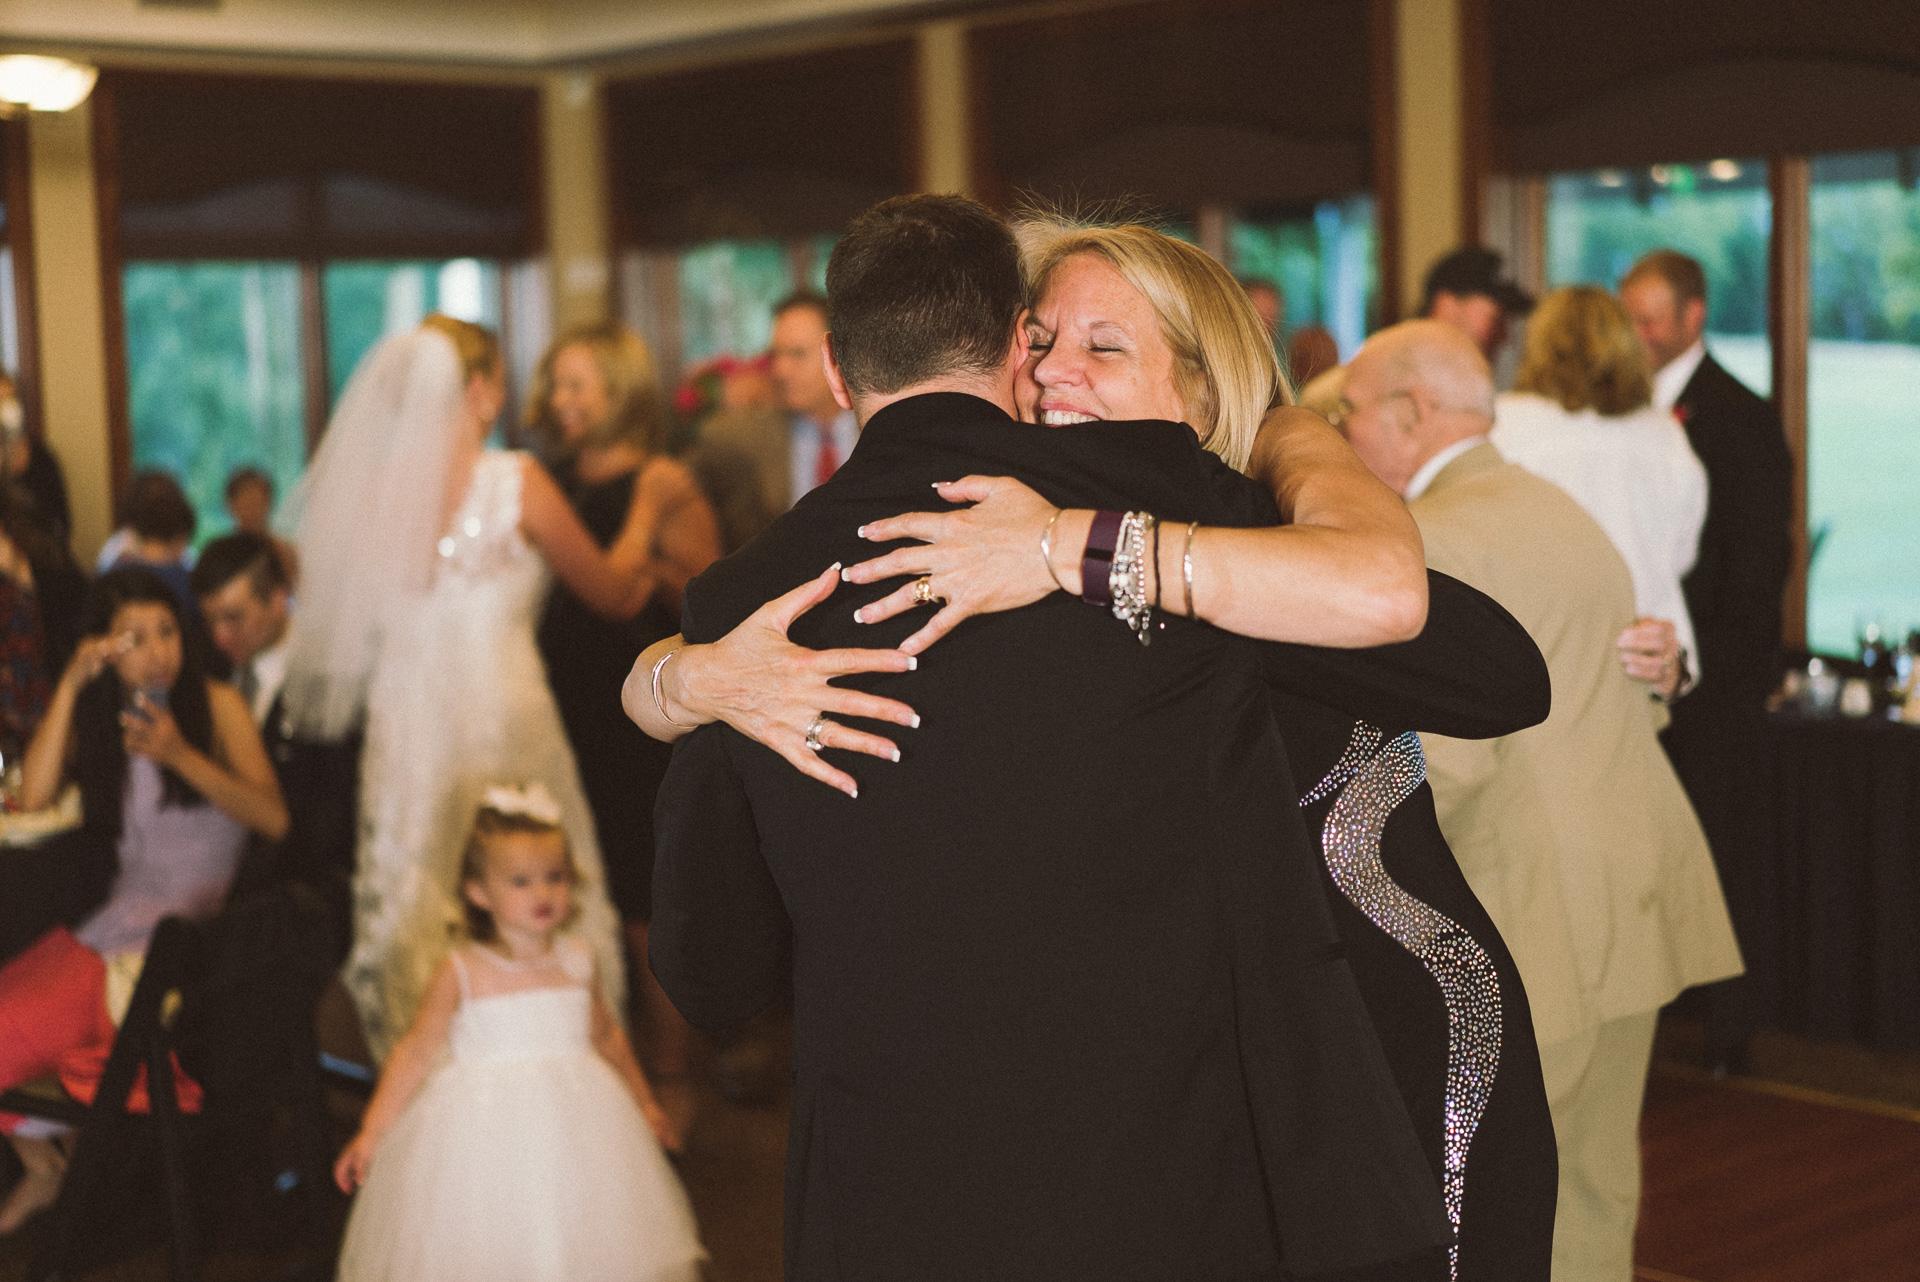 Dayton Wedding Photographer - Groom and mother